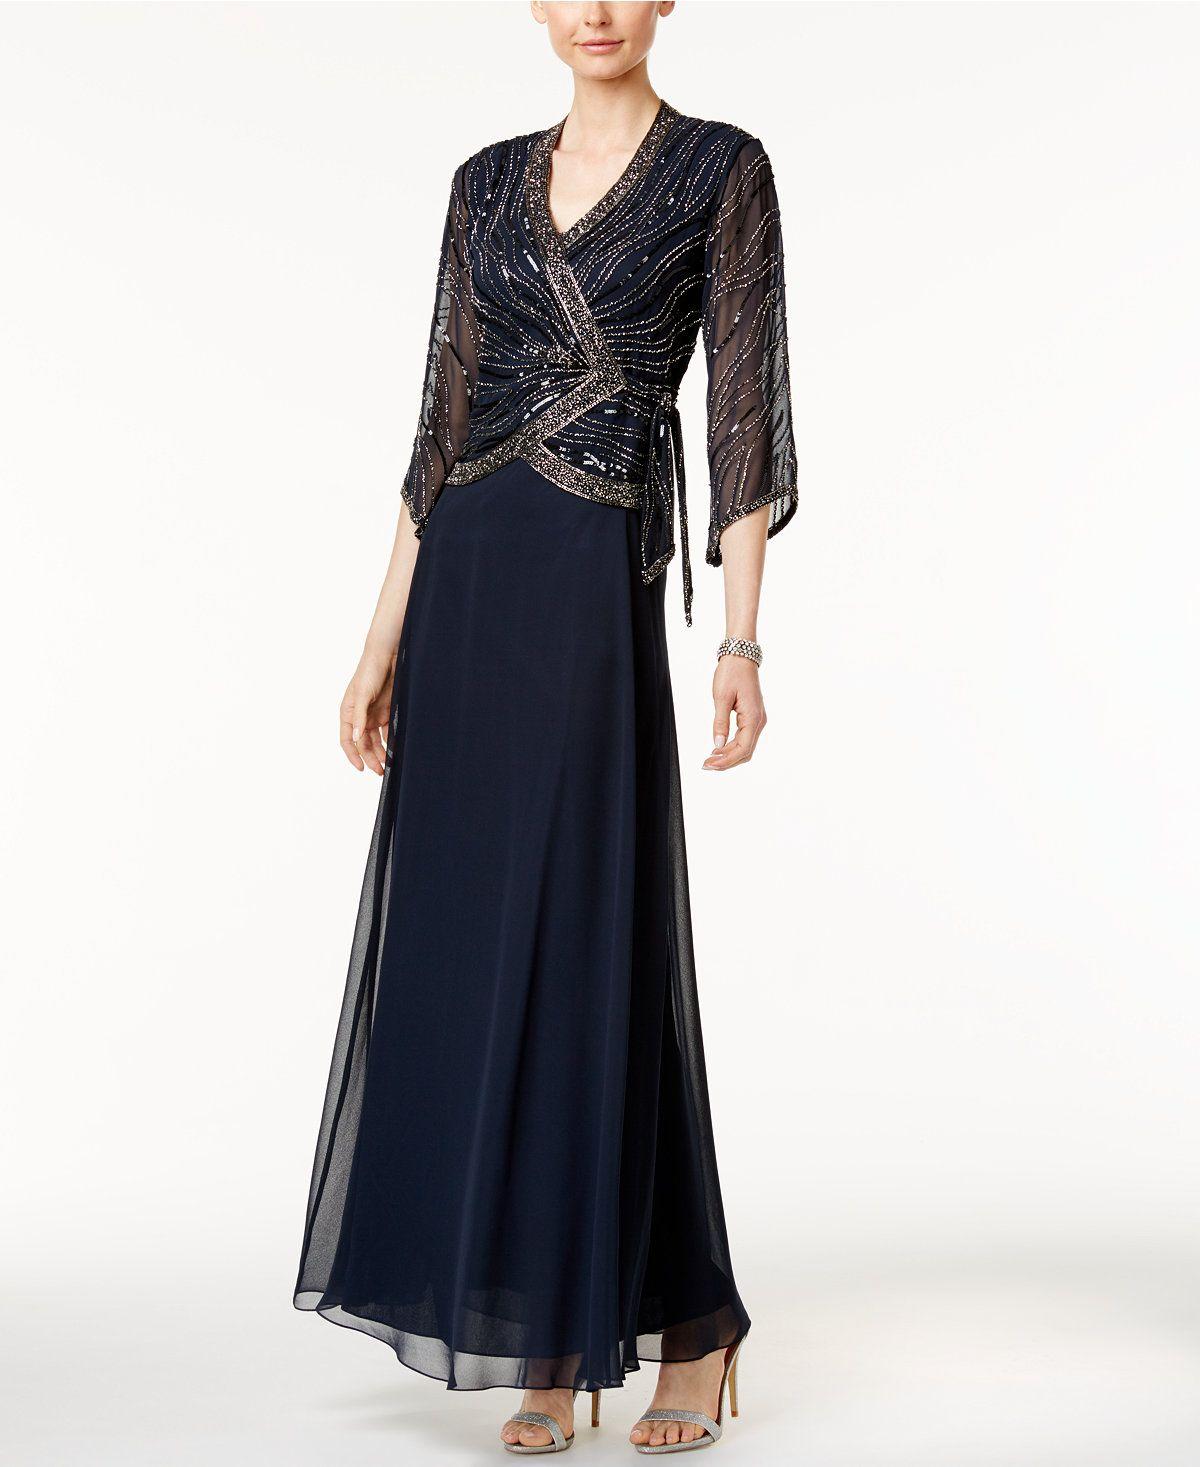 Macys womens dresses wedding  J Kara Beaded FauxWrap Gown  Dresses  Women  Macyus  Shawnnaus